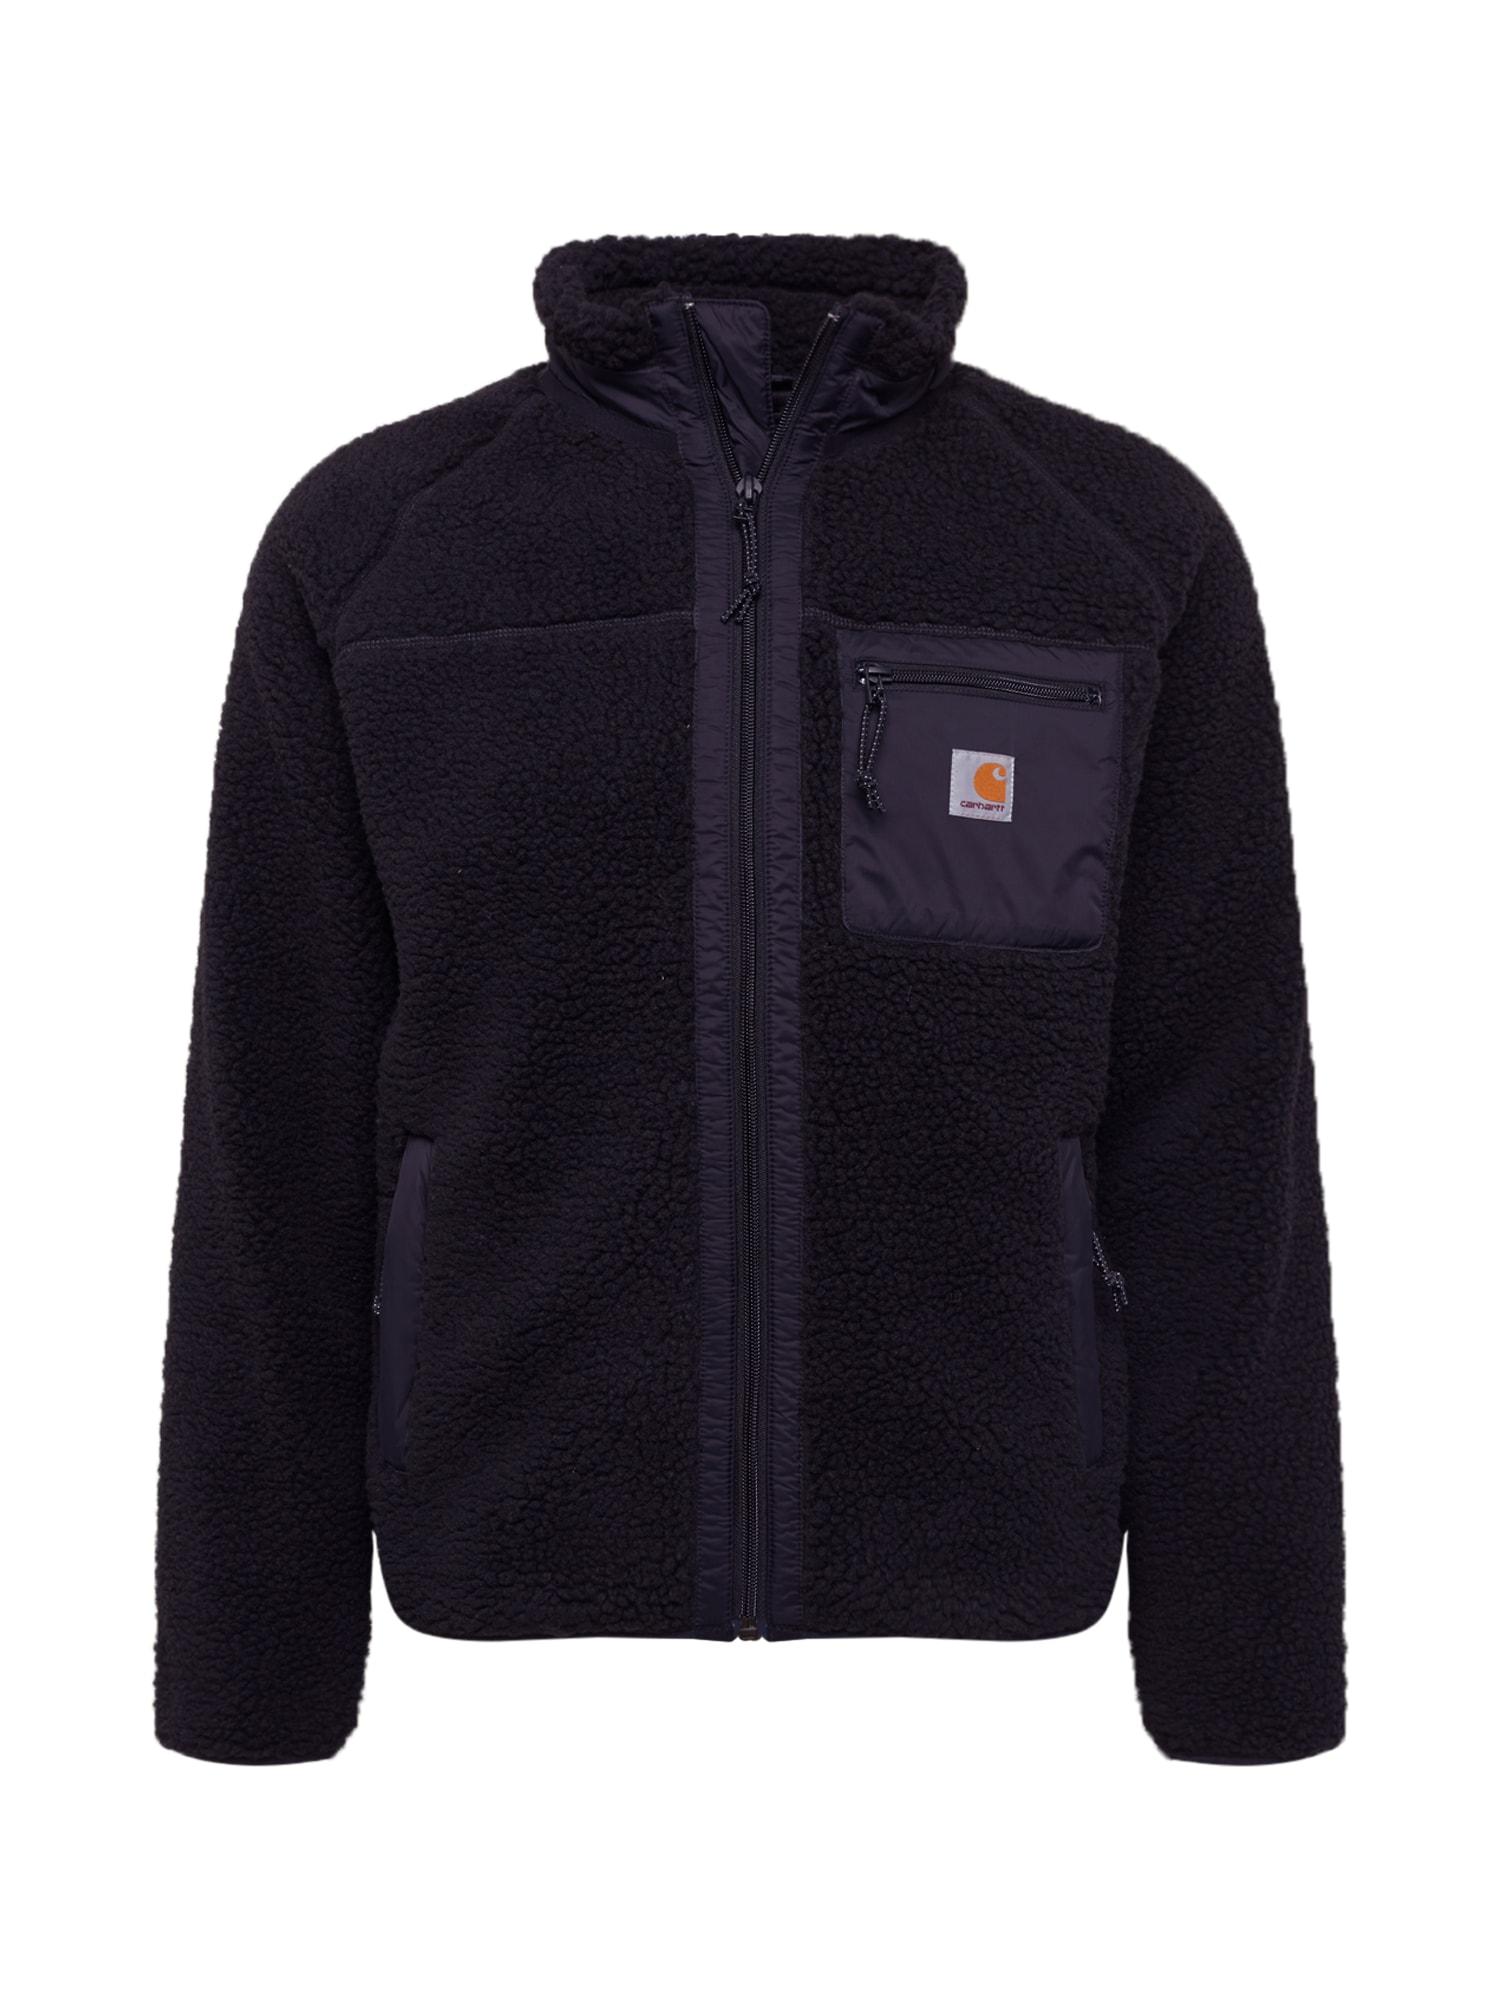 Carhartt WIP Prechodná bunda 'Prentis Liner'  čierna